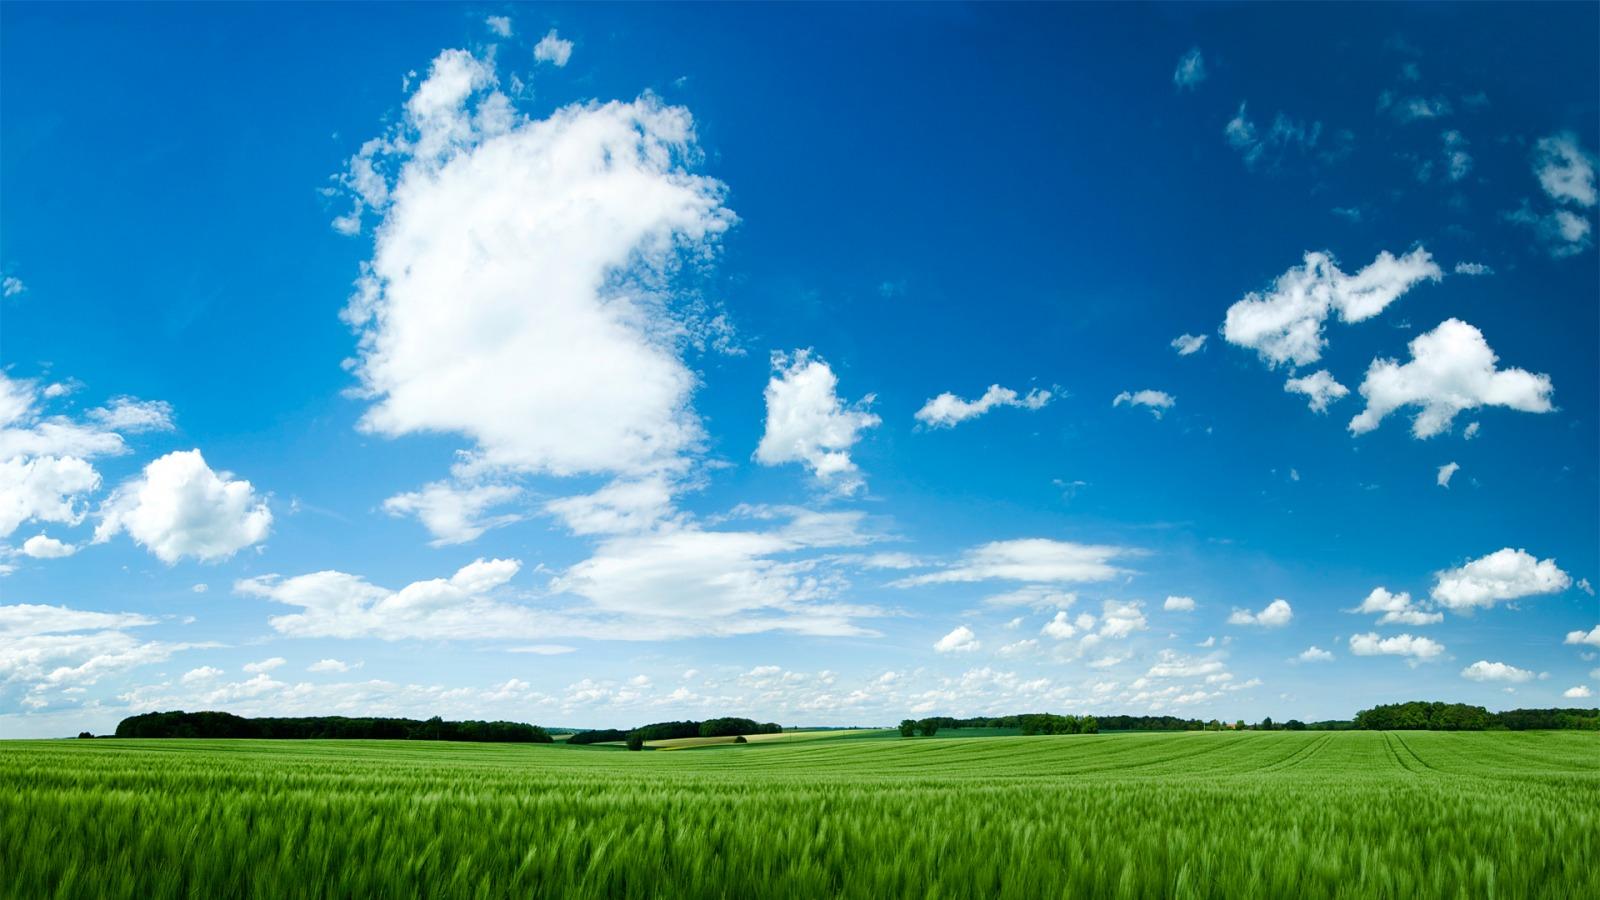 summer landscape image wallpaper - photo #7